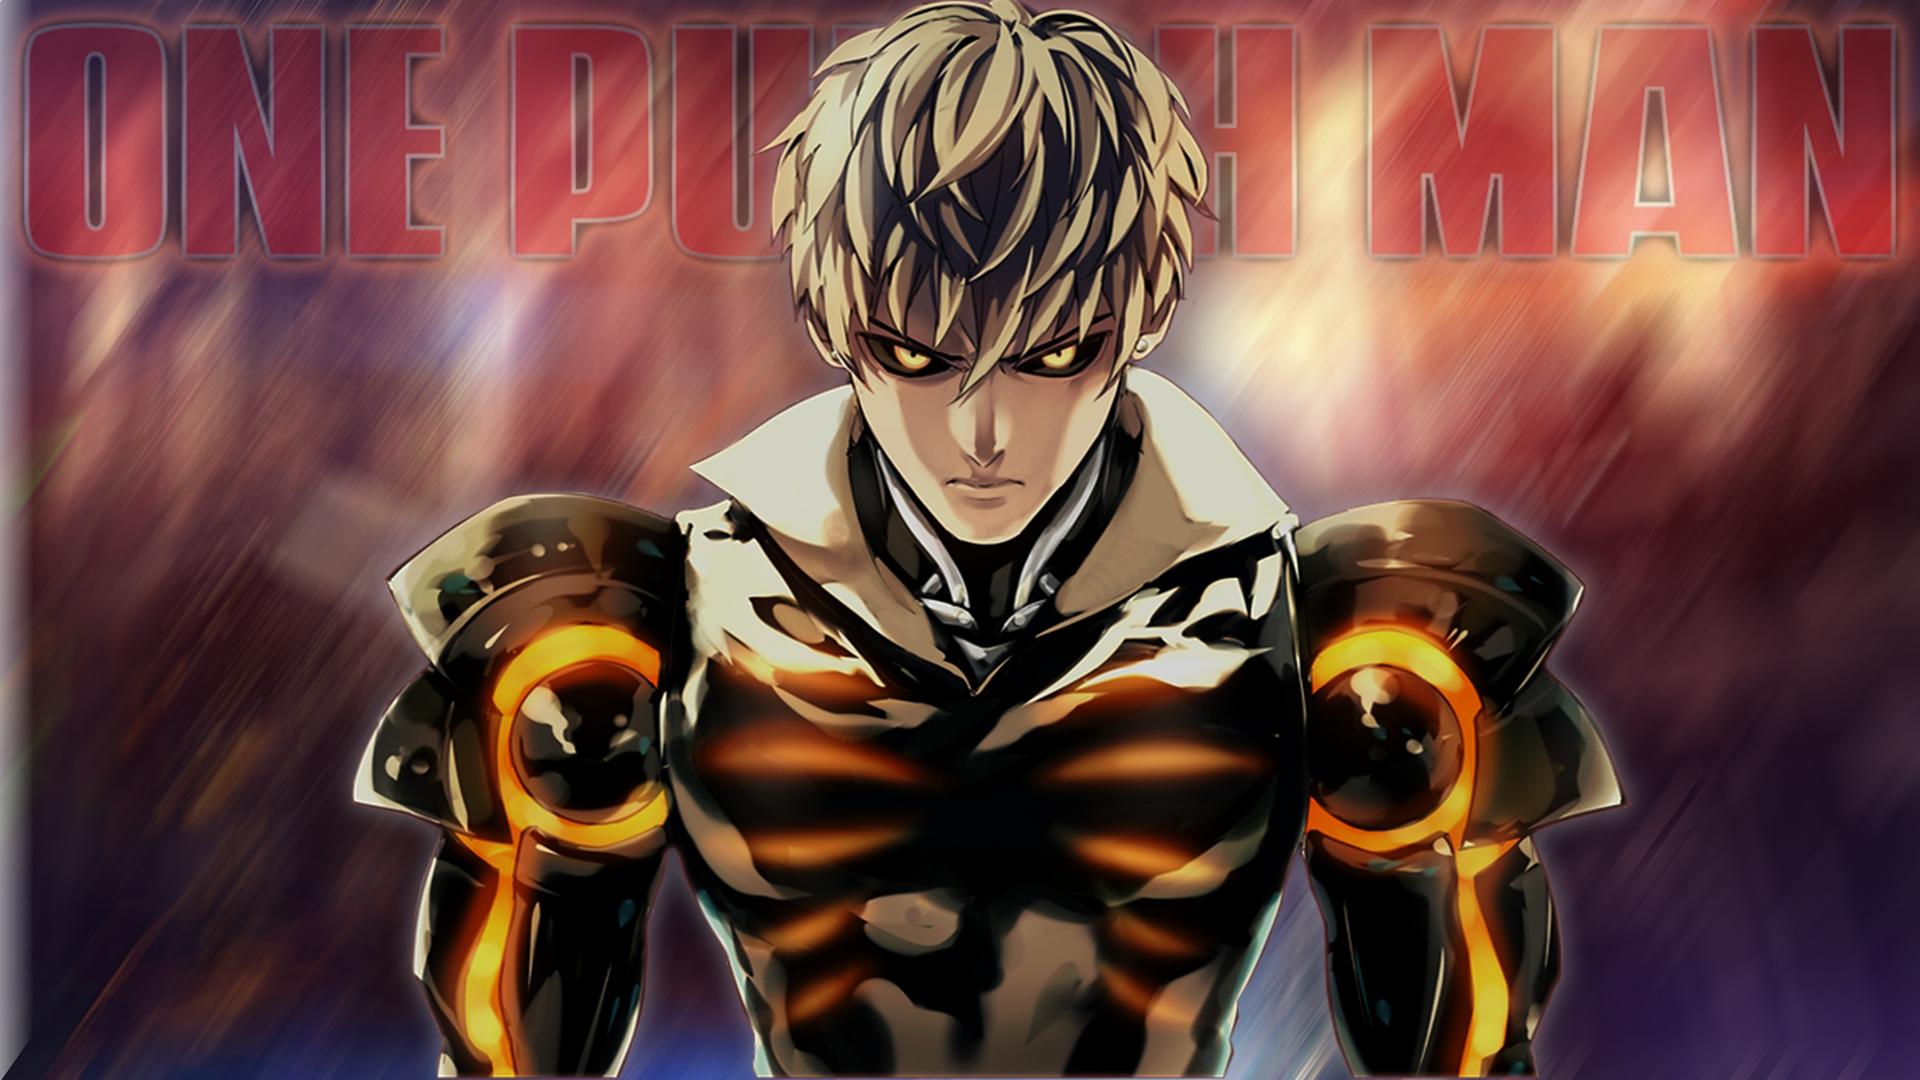 Wallpaper Genos One Punch Man Anime Boys Yellow Eyes Glowing